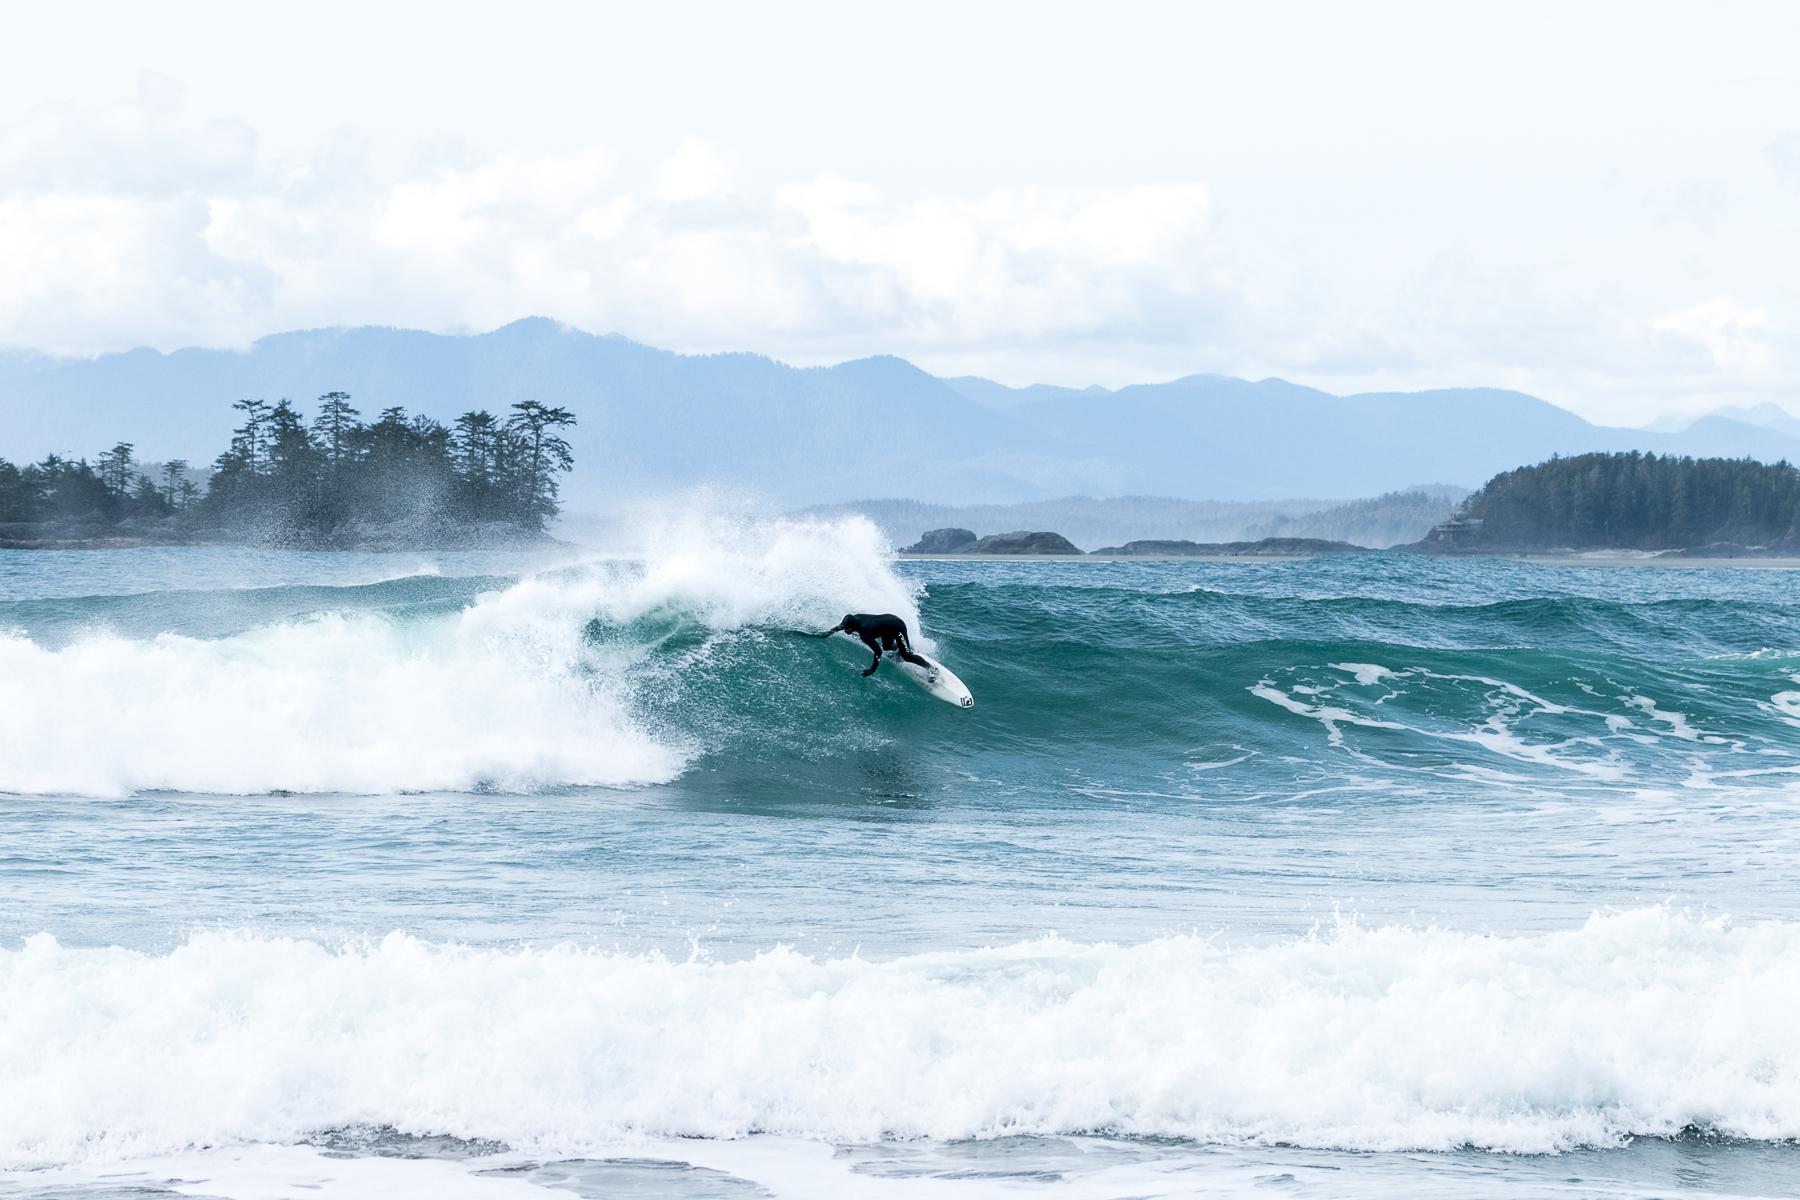 tofino_surf_photography-frazer_mayor_2019_oneill.jpg